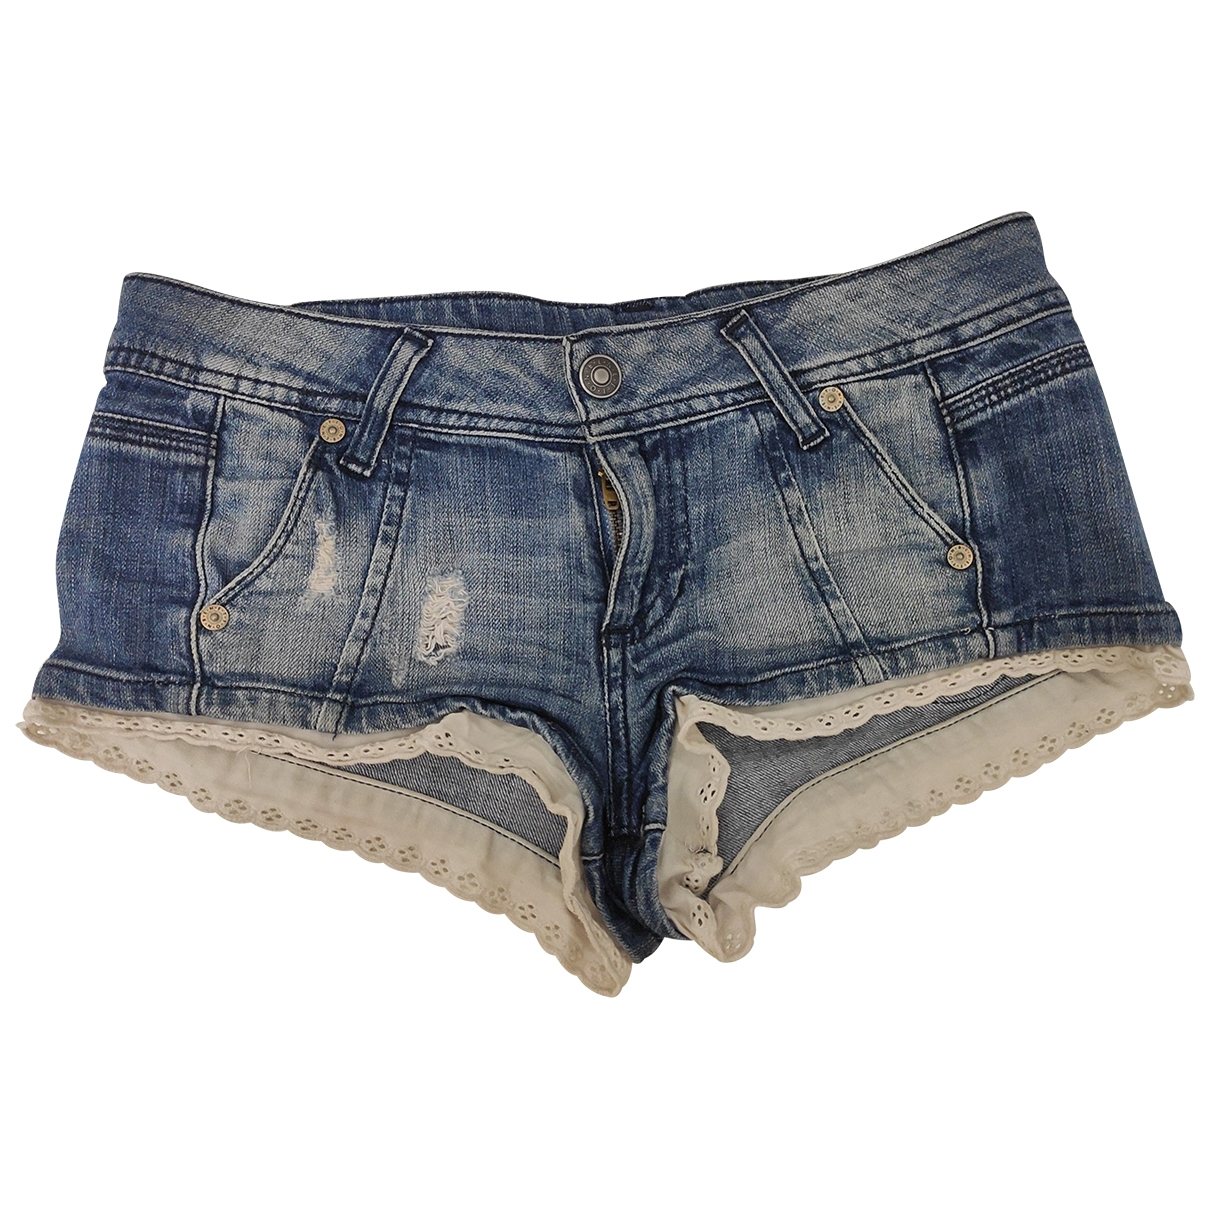 Benetton \N Shorts in  Blau Denim - Jeans